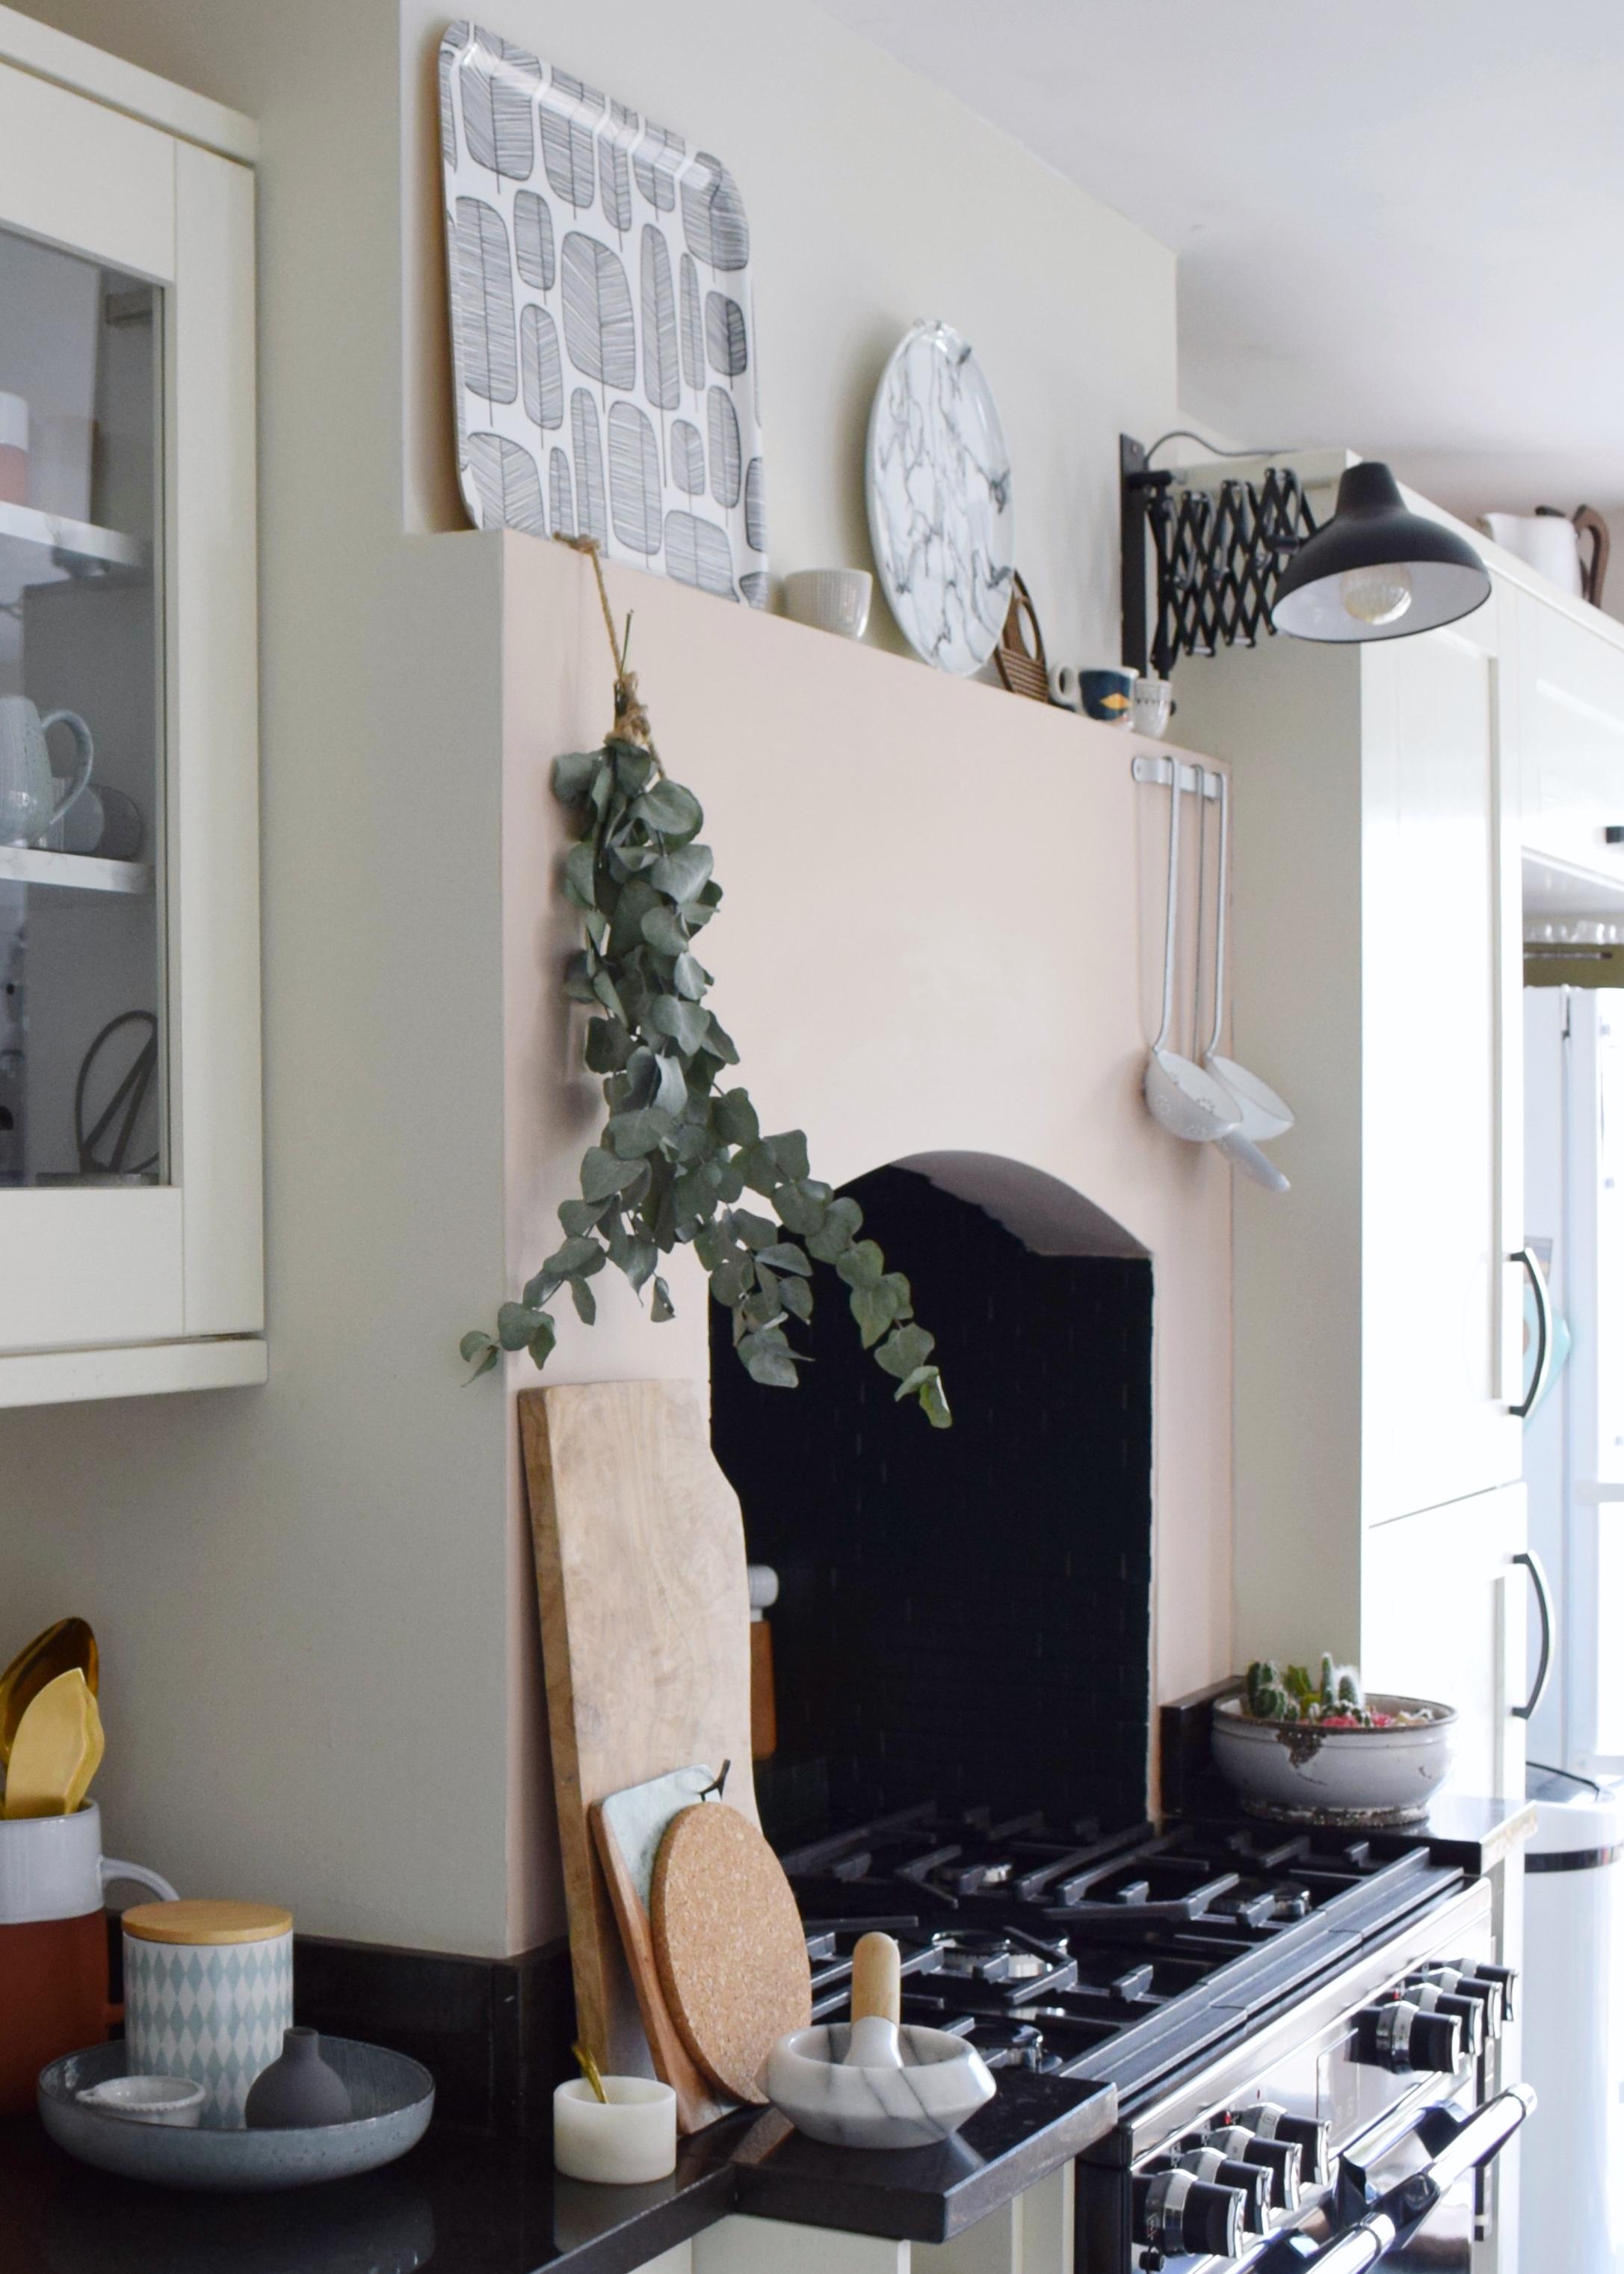 Kitchen Farrow ball slipper satin, vintage Scandinavian rustic budget kitchen refresh, artisan design and styling, eucalyptus (9) copy.jpg